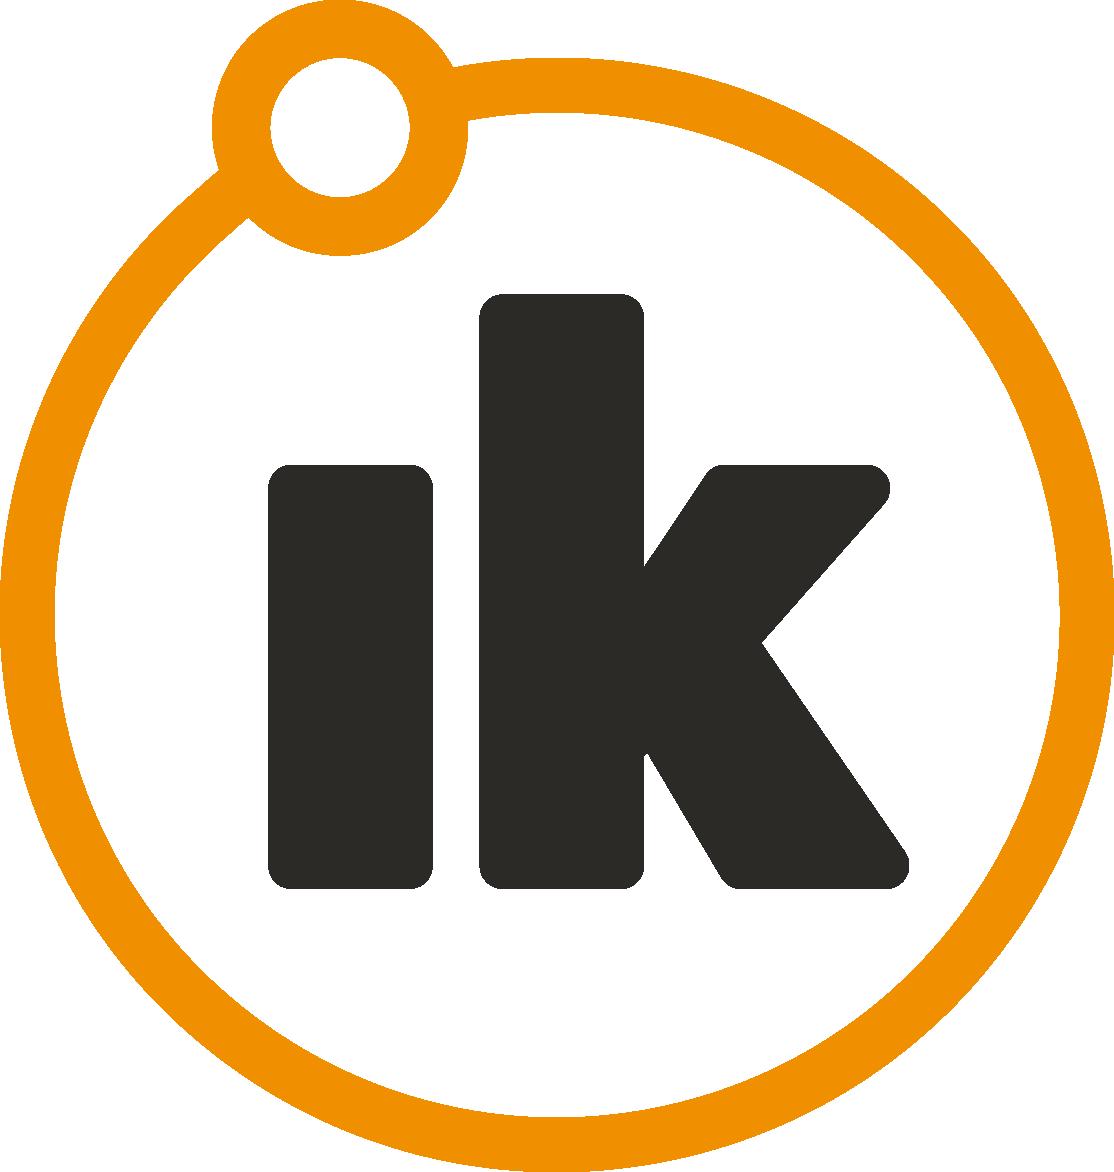 Logo The Infinite Kind